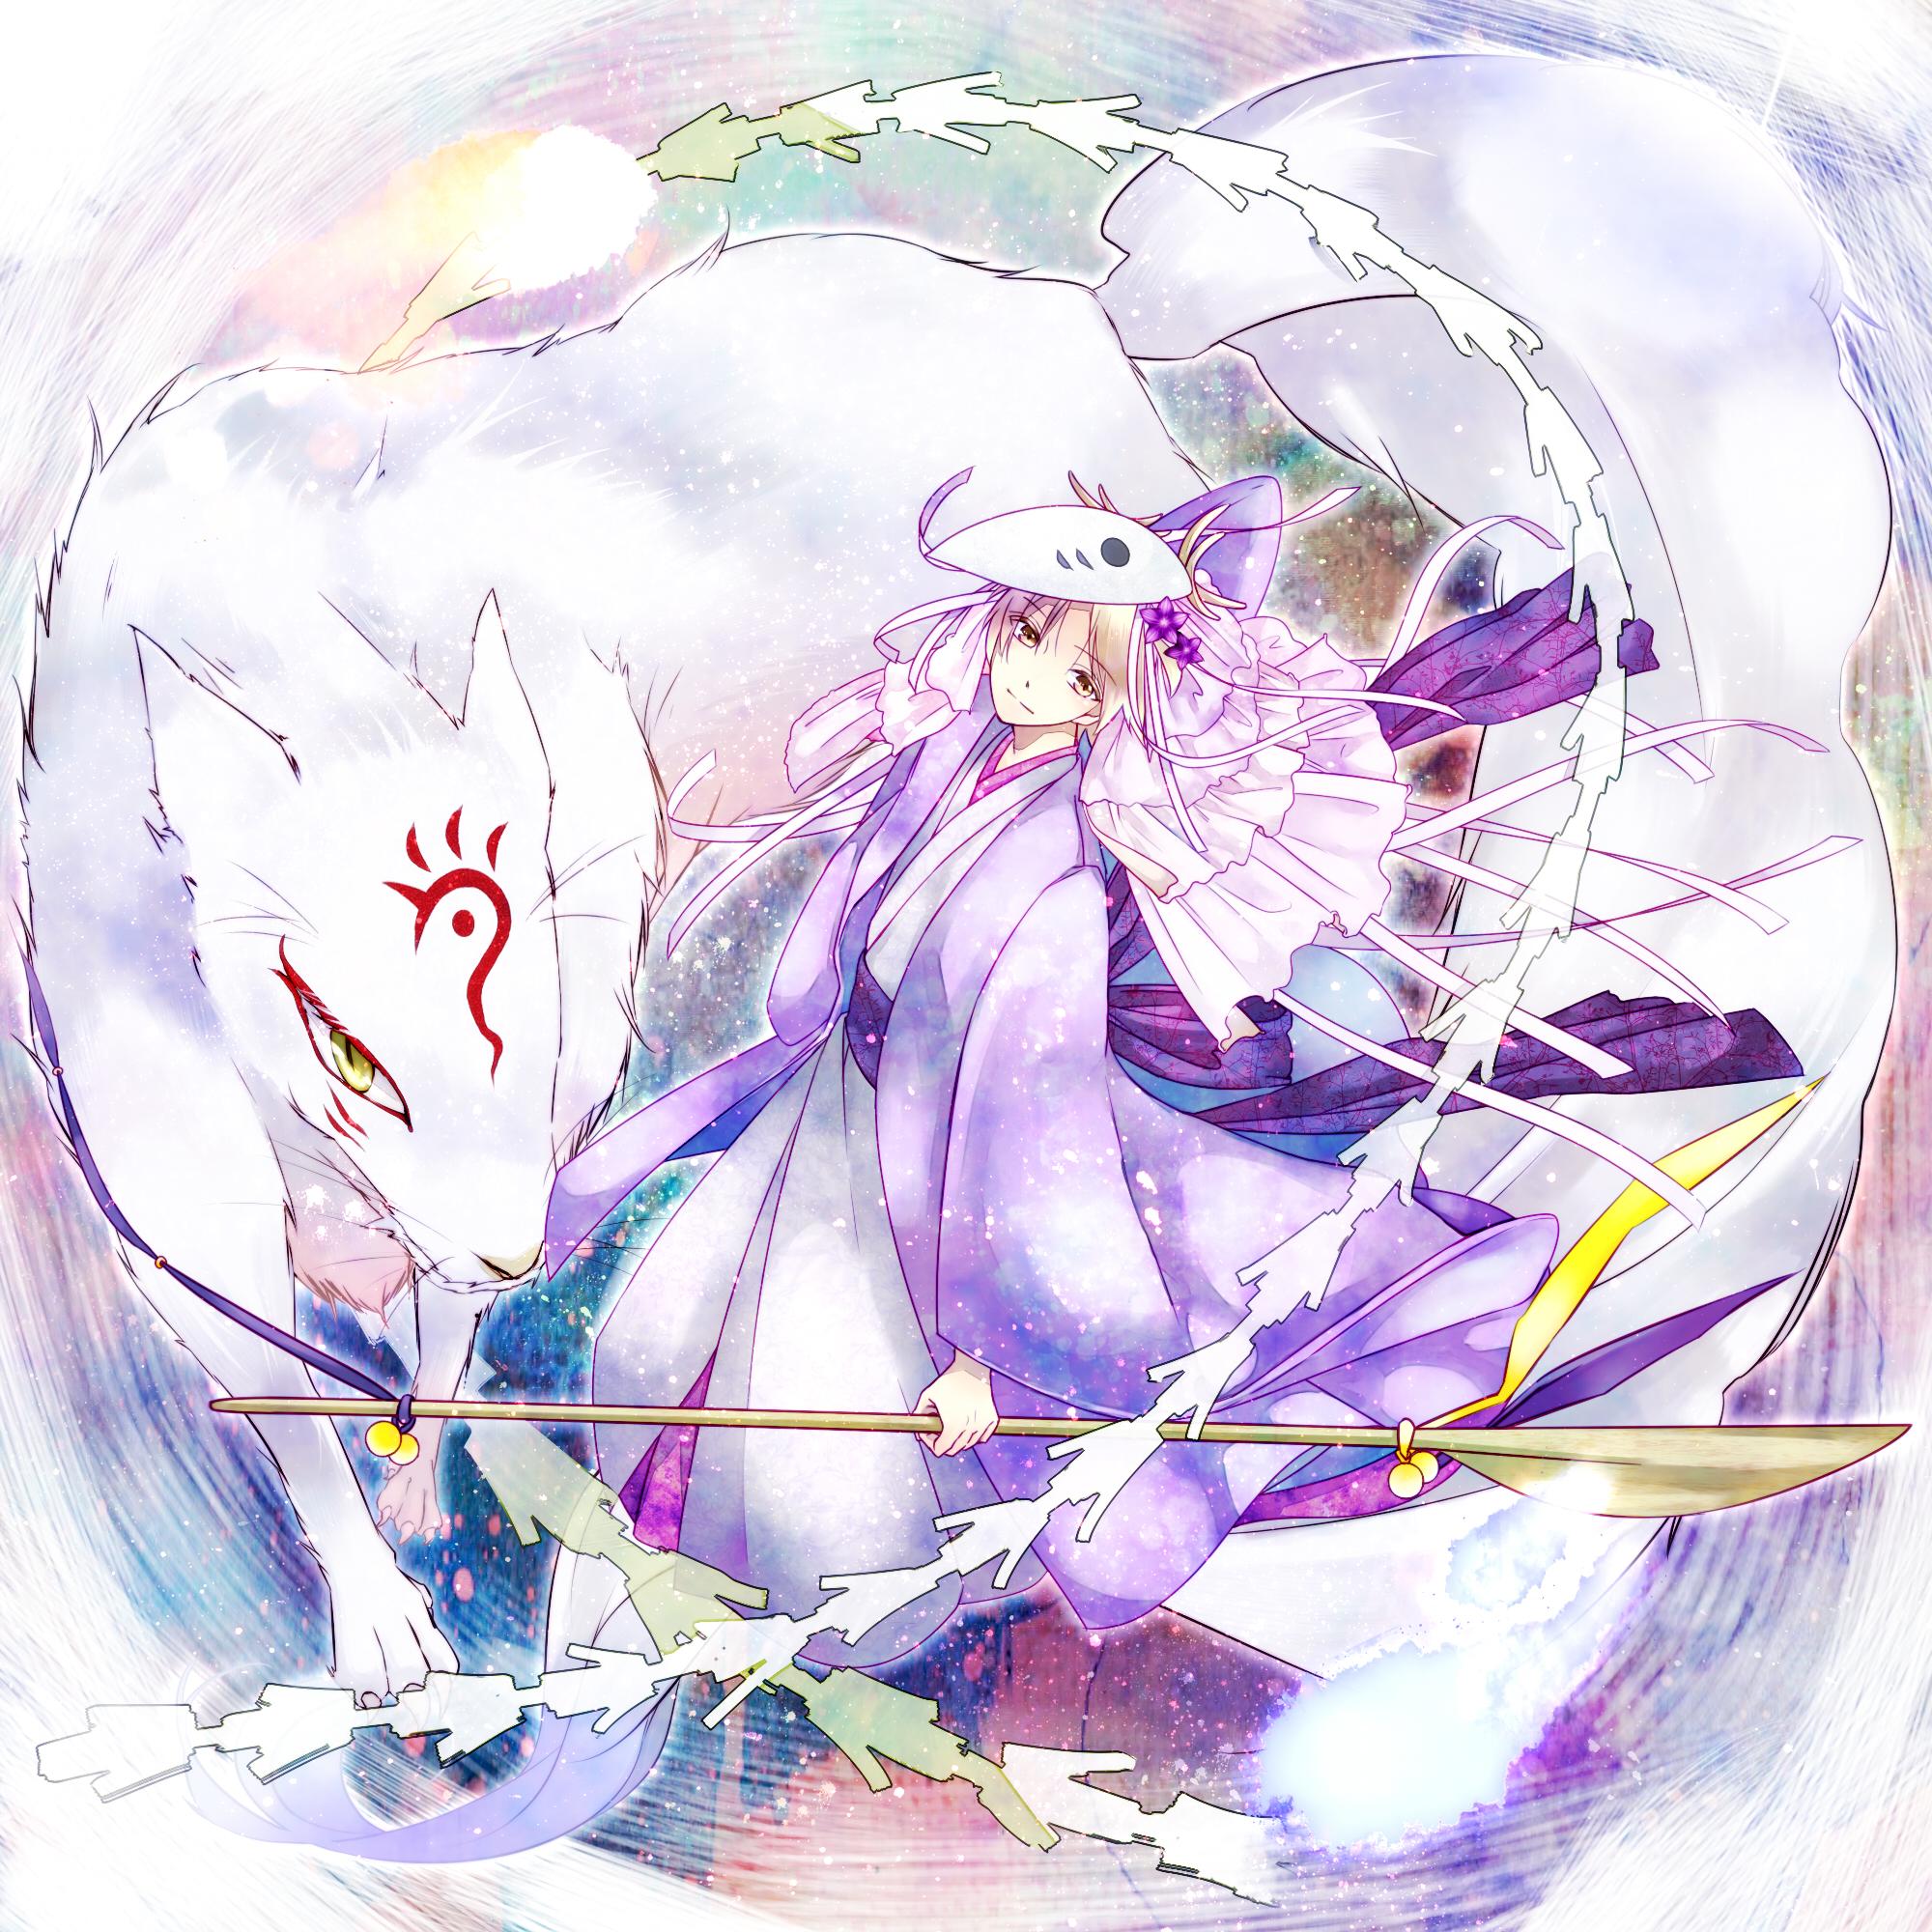 Download Anime Natsume Yuujinchou: Page 15 Of 86 - Zerochan Anime Image Board